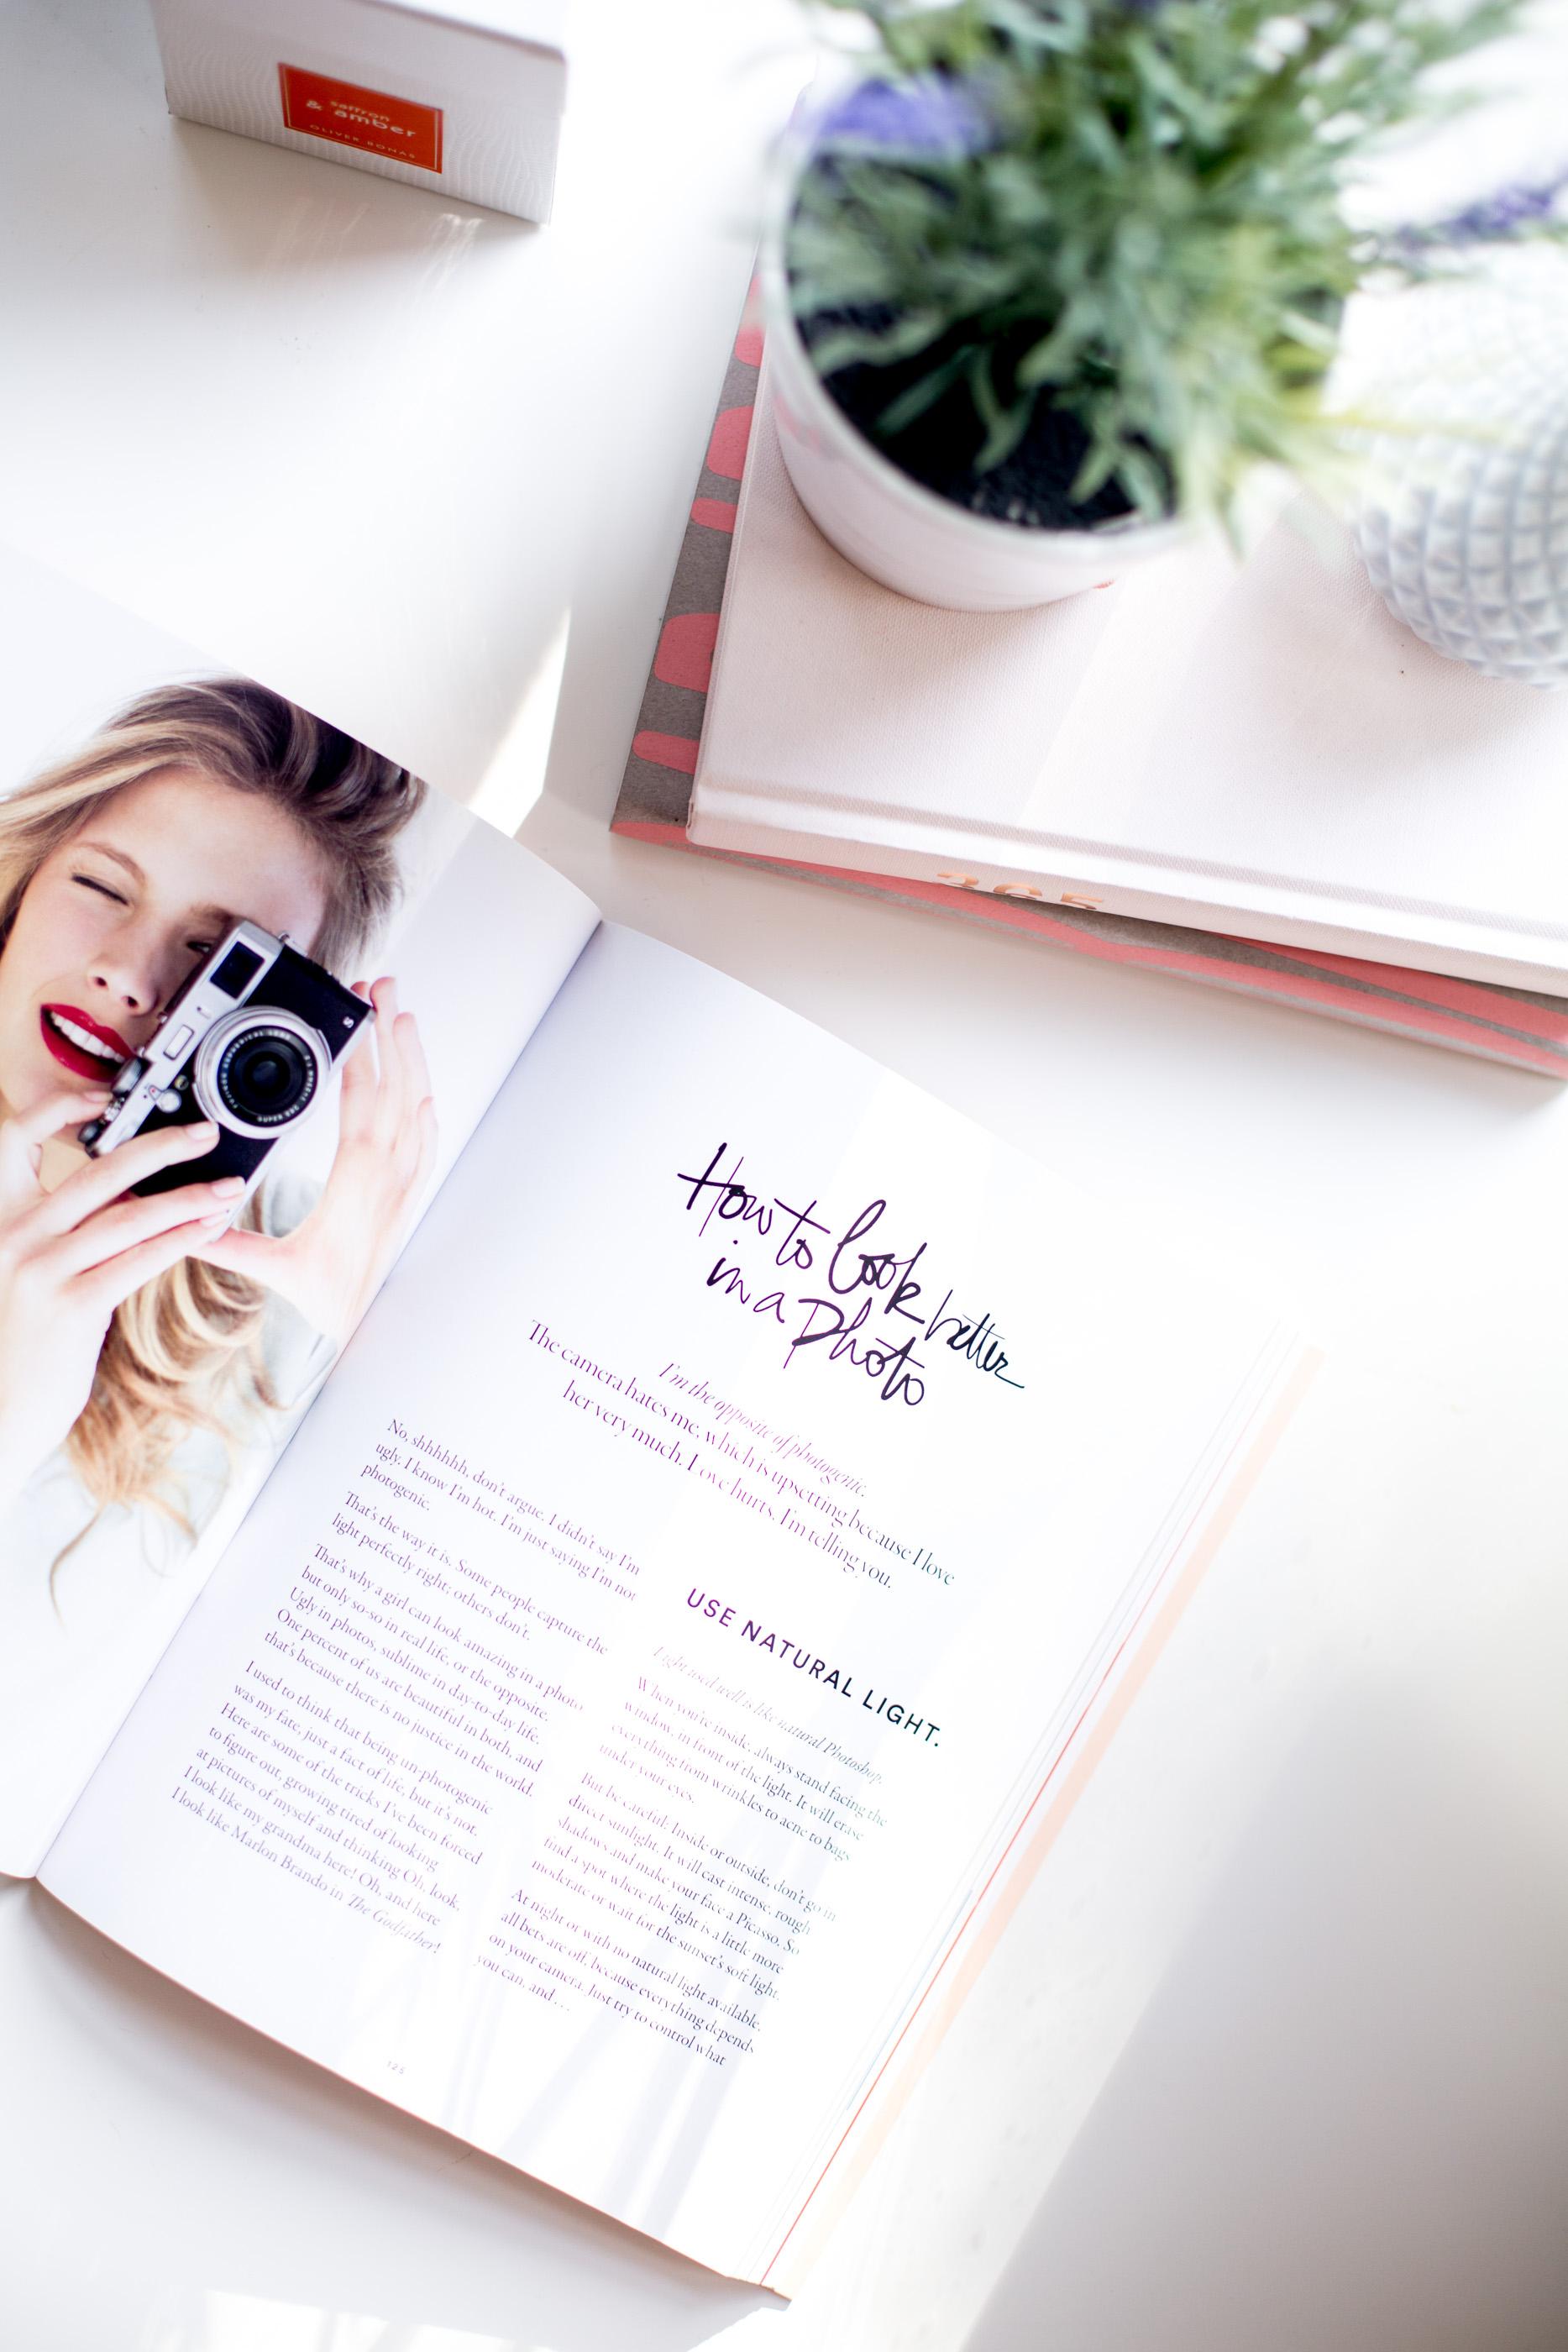 Mediamarmalade_Blogging_tips-46